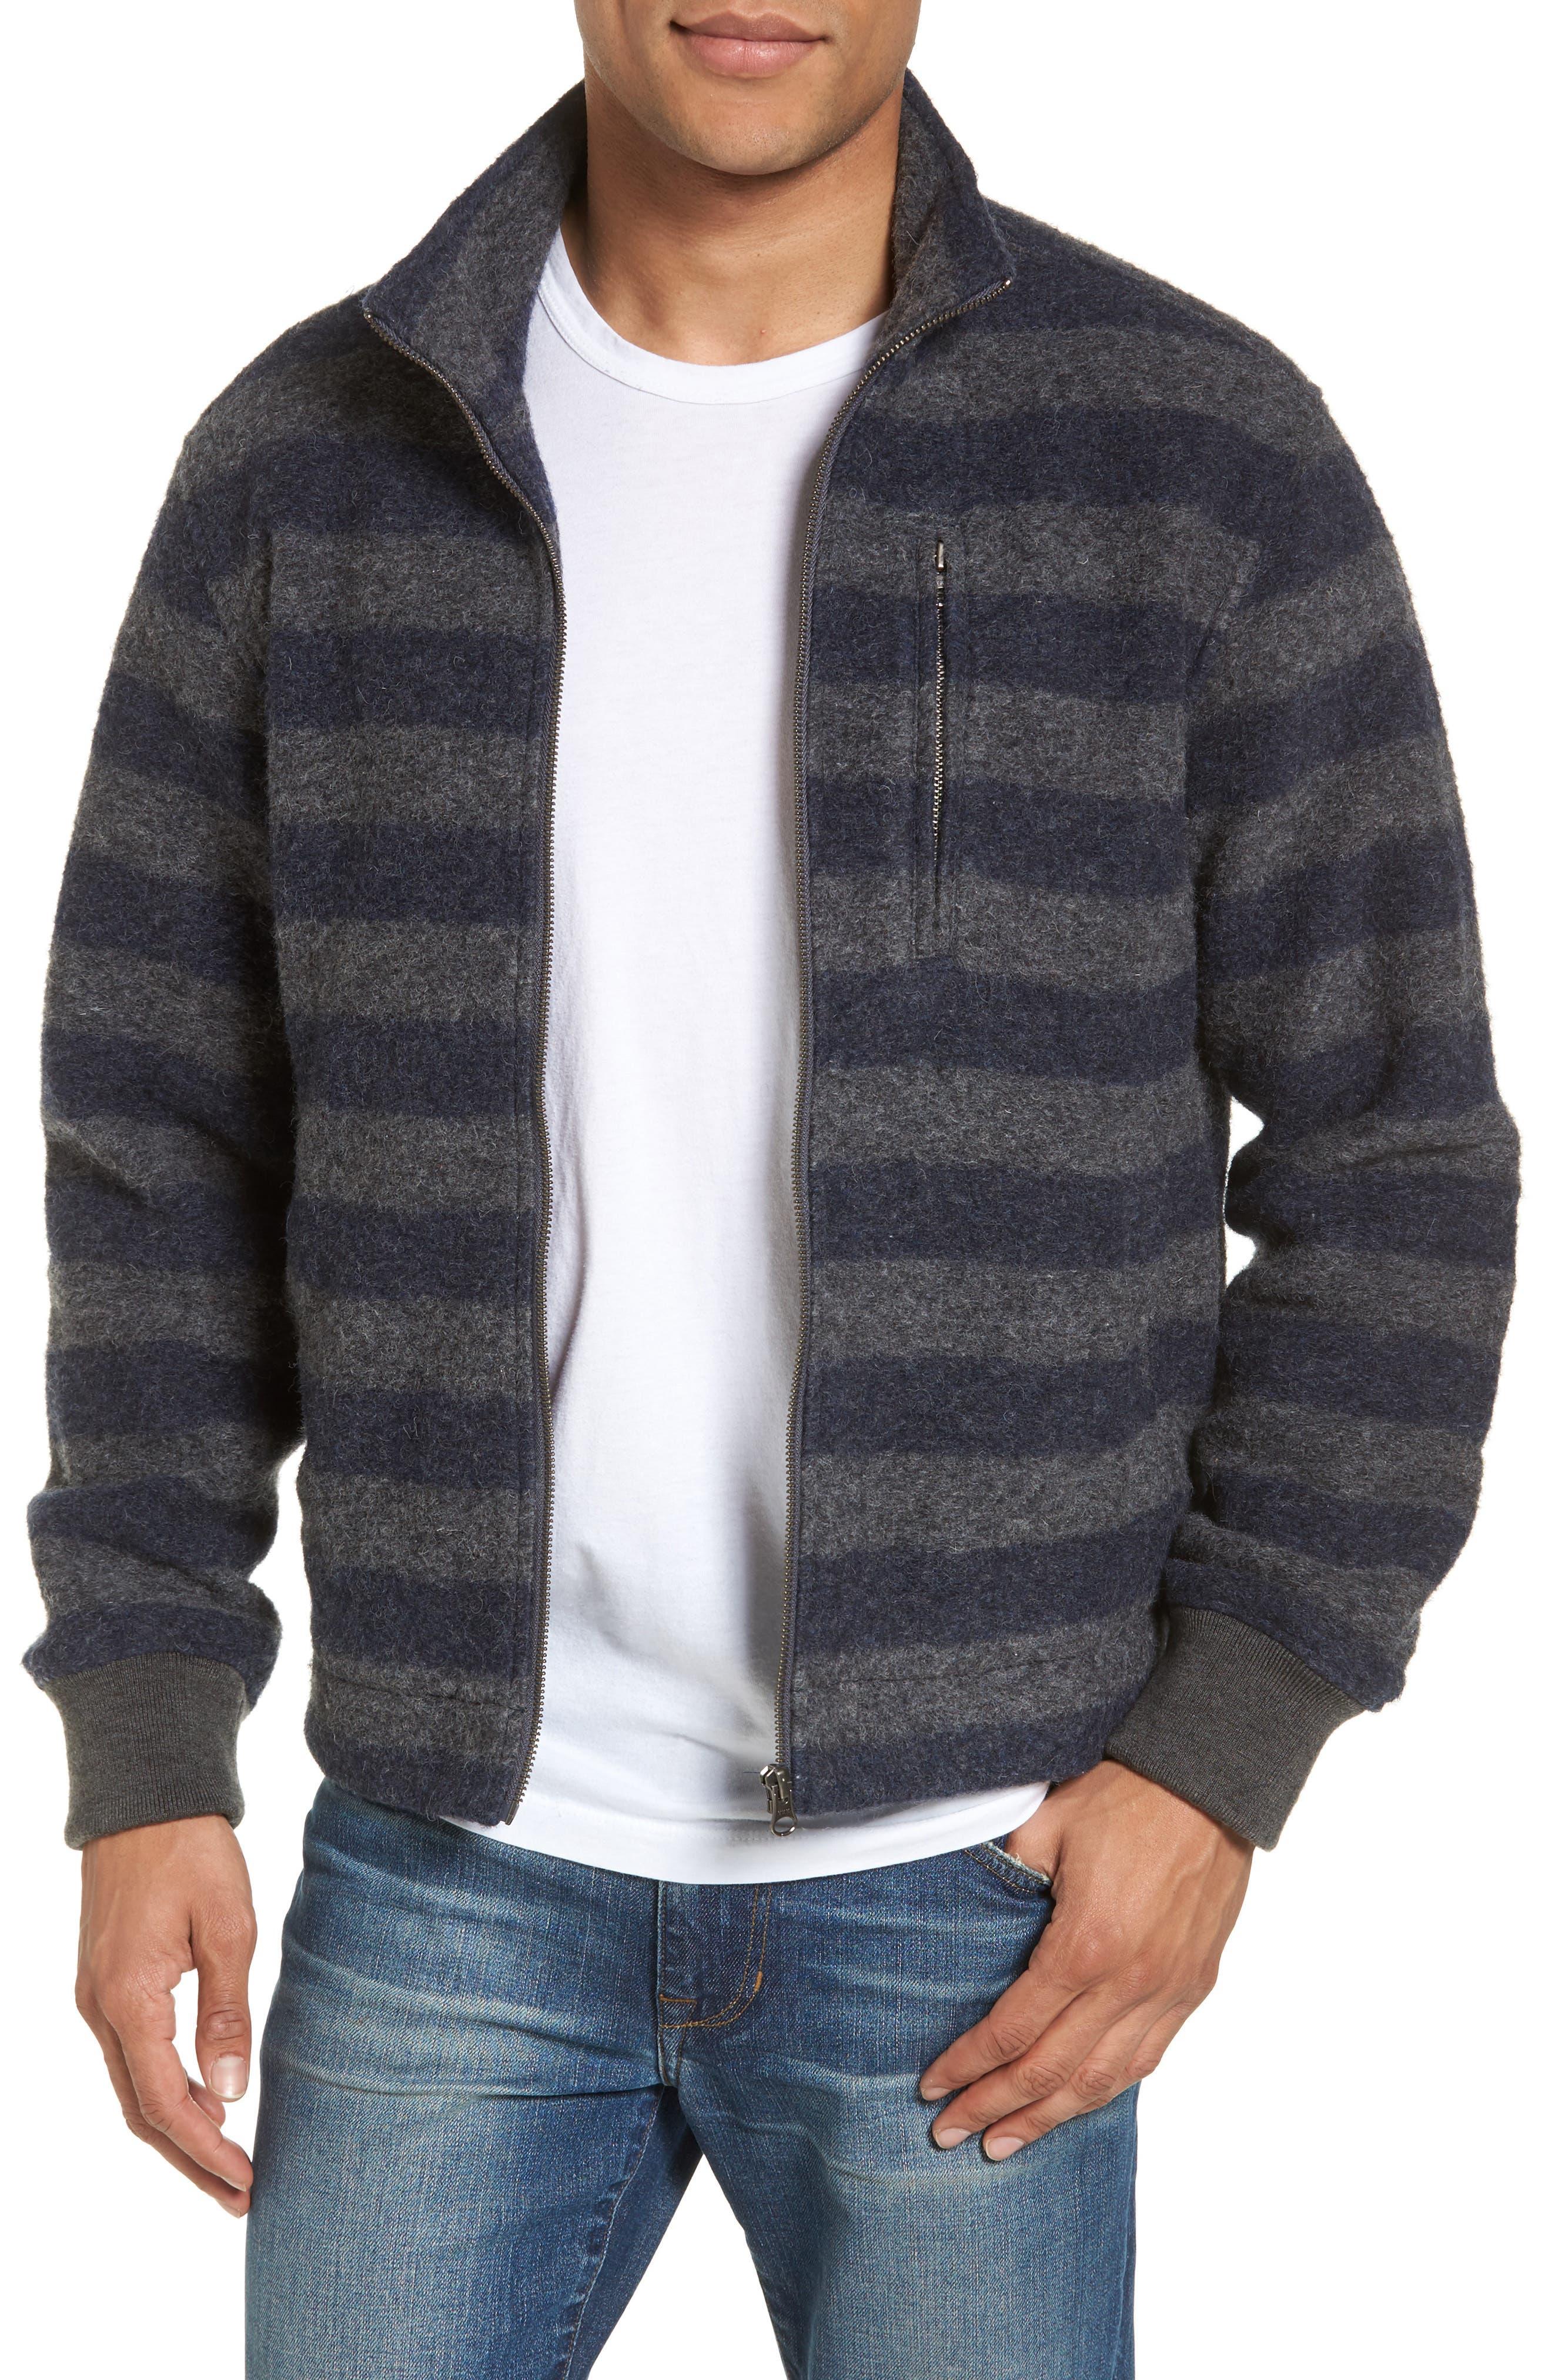 Bowen Stripe Zip Front Jacket,                             Main thumbnail 1, color,                             Grey Navy Stripe